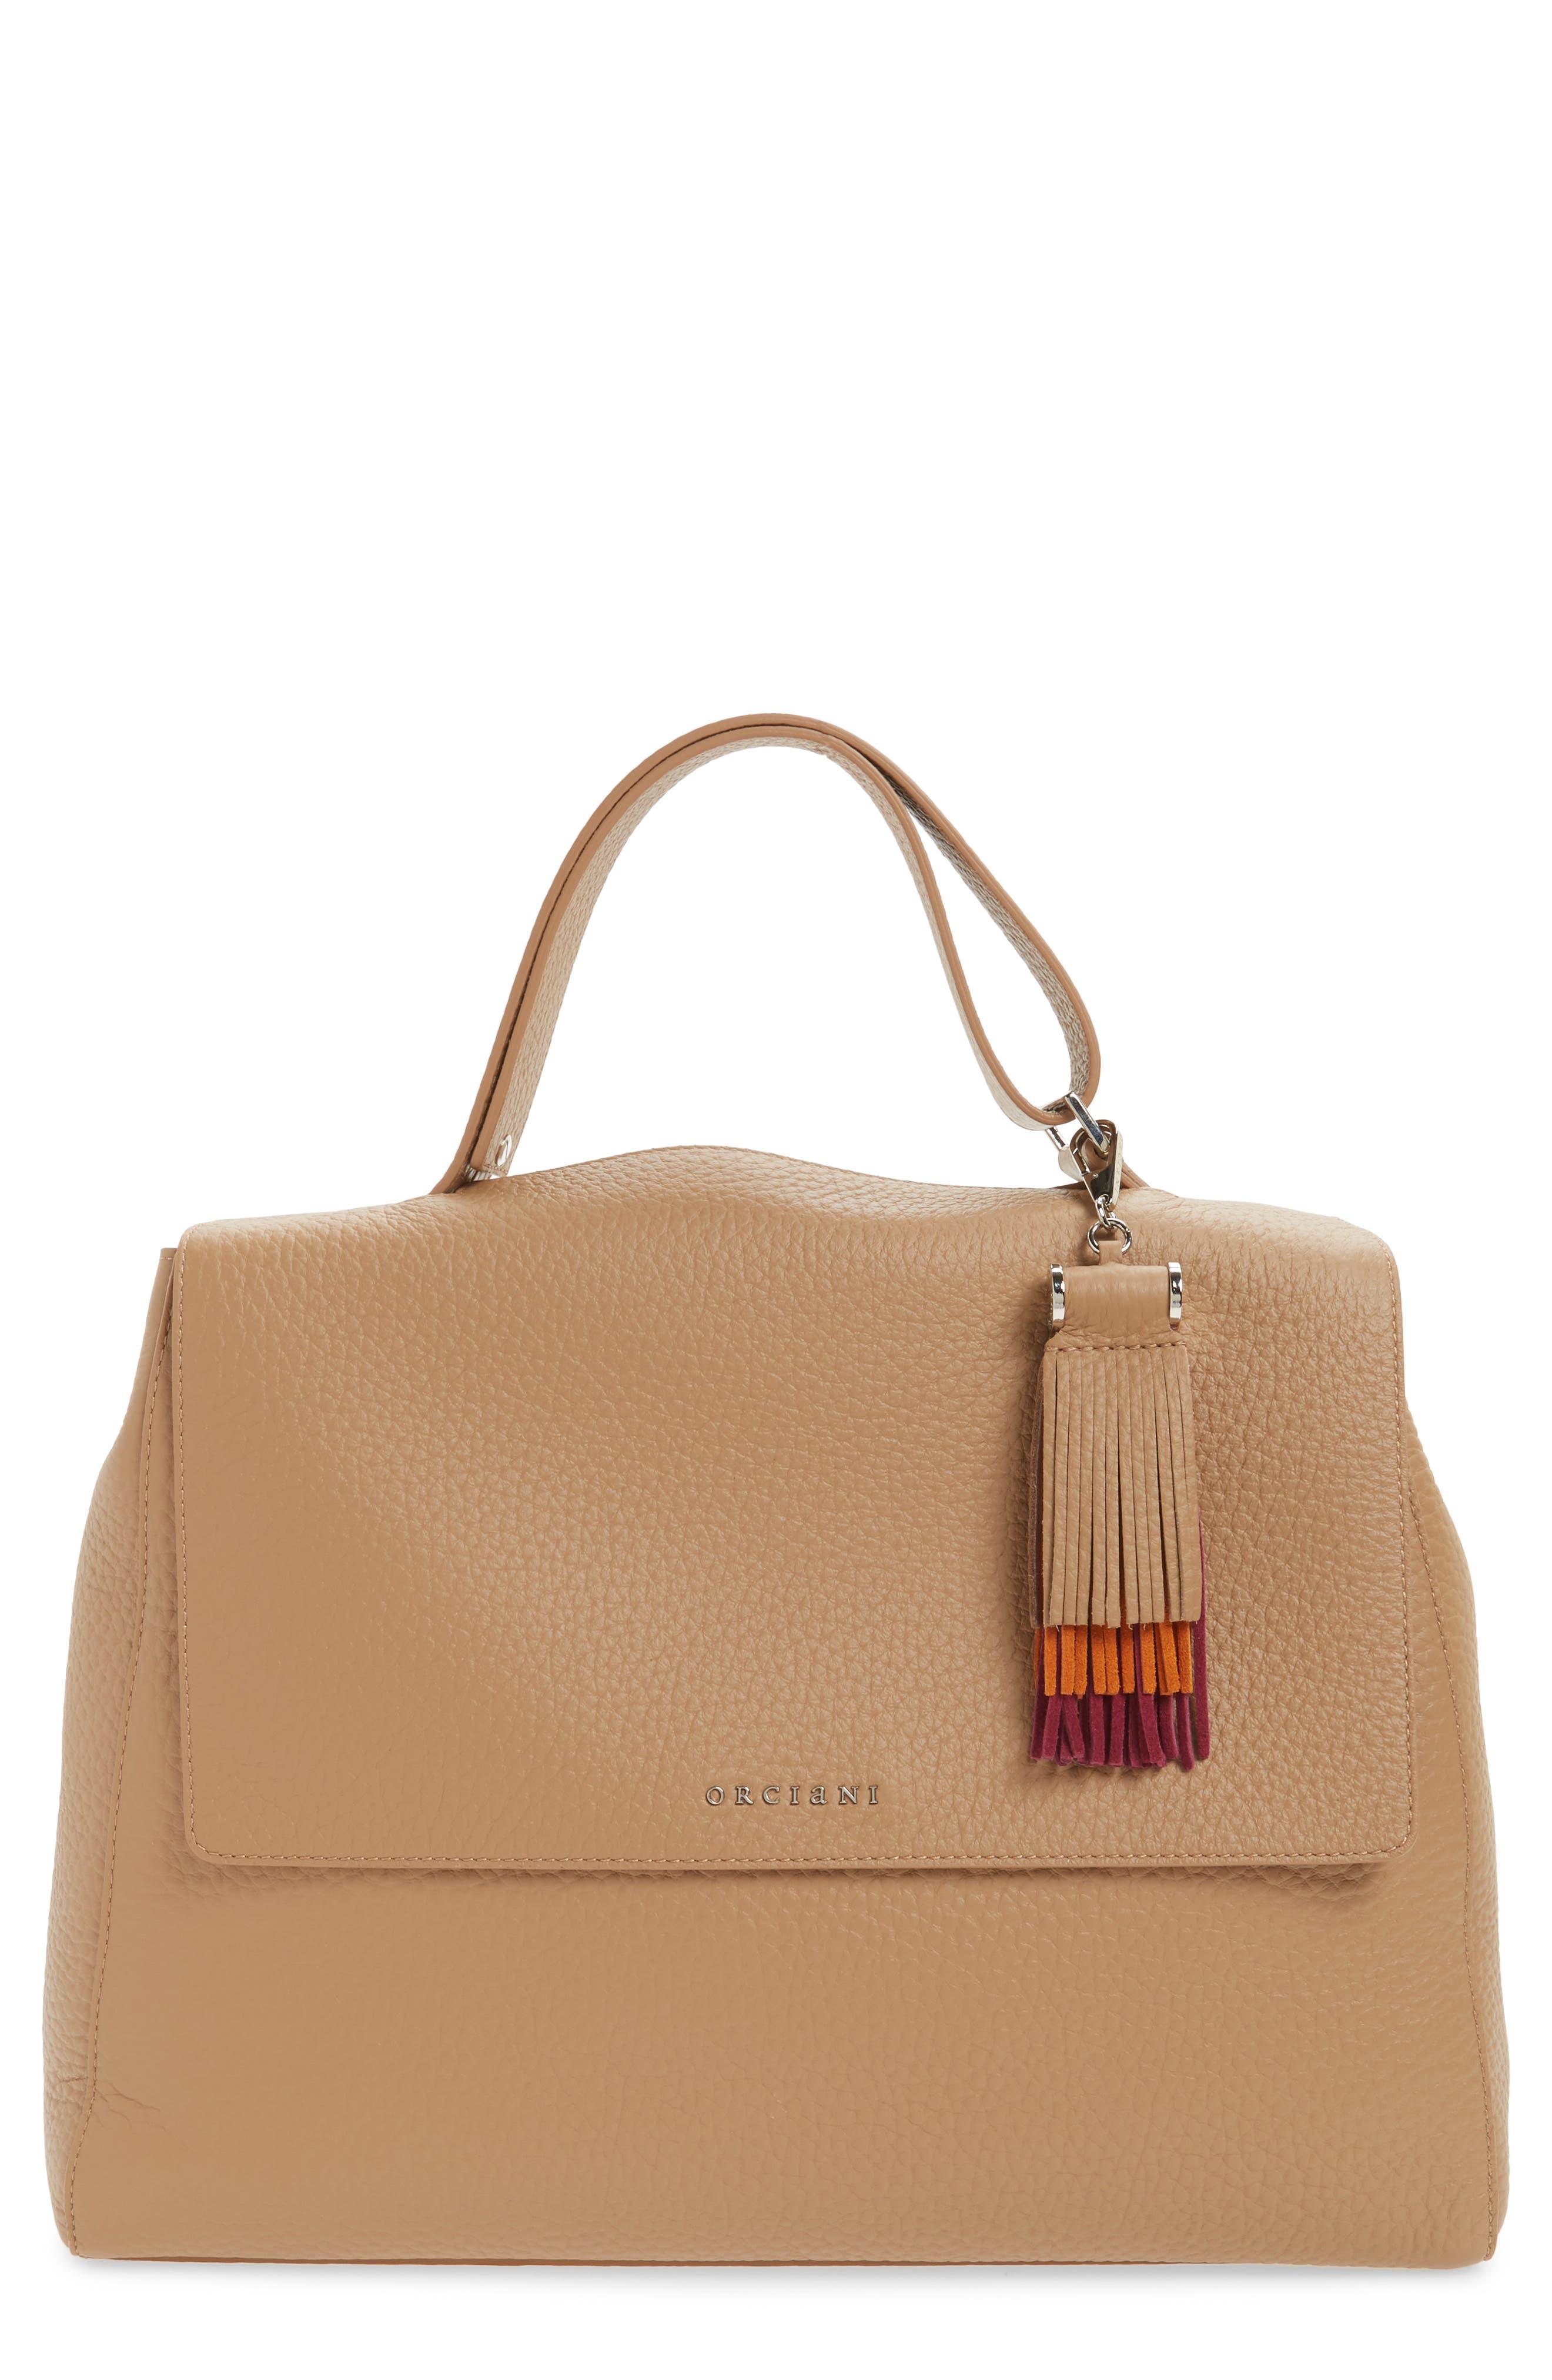 ORCIANI Double Leather Top Handle Satchel & Tassel Bag Charm